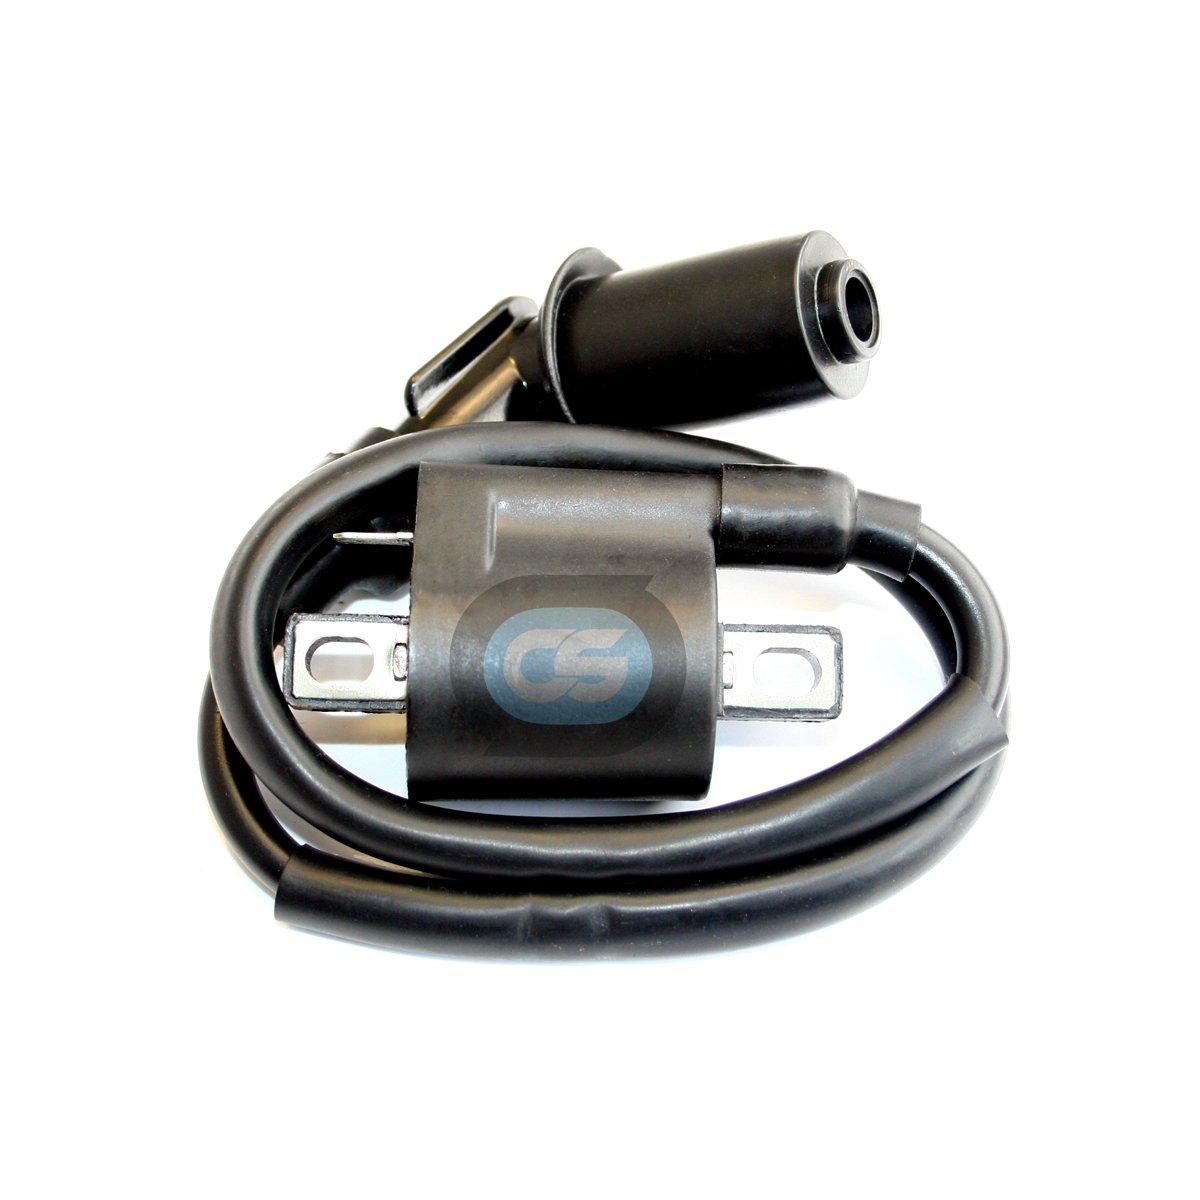 Ignition Coil Yamaha Yfm225 Yfm 225 Moto 4 86 88 Automotive Wiring Diagram For 250